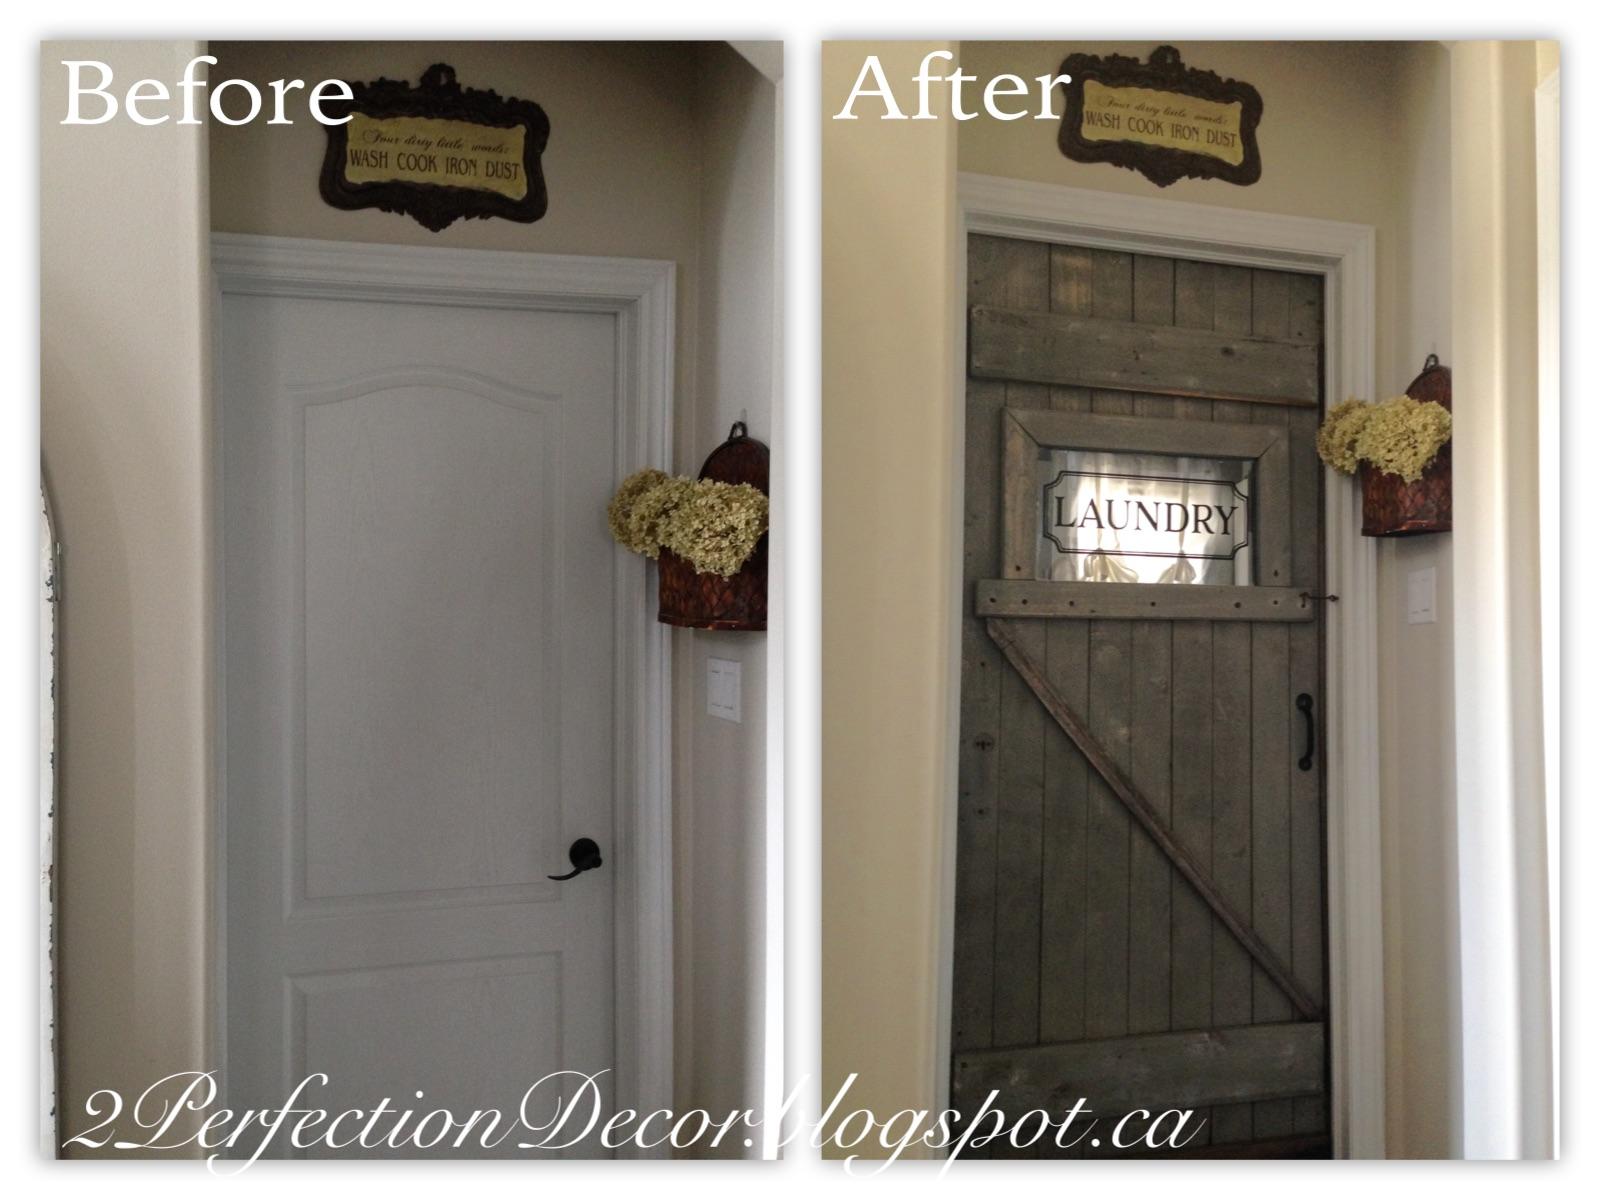 2Perfection Decor Antique Barn Door as our Laundry room door